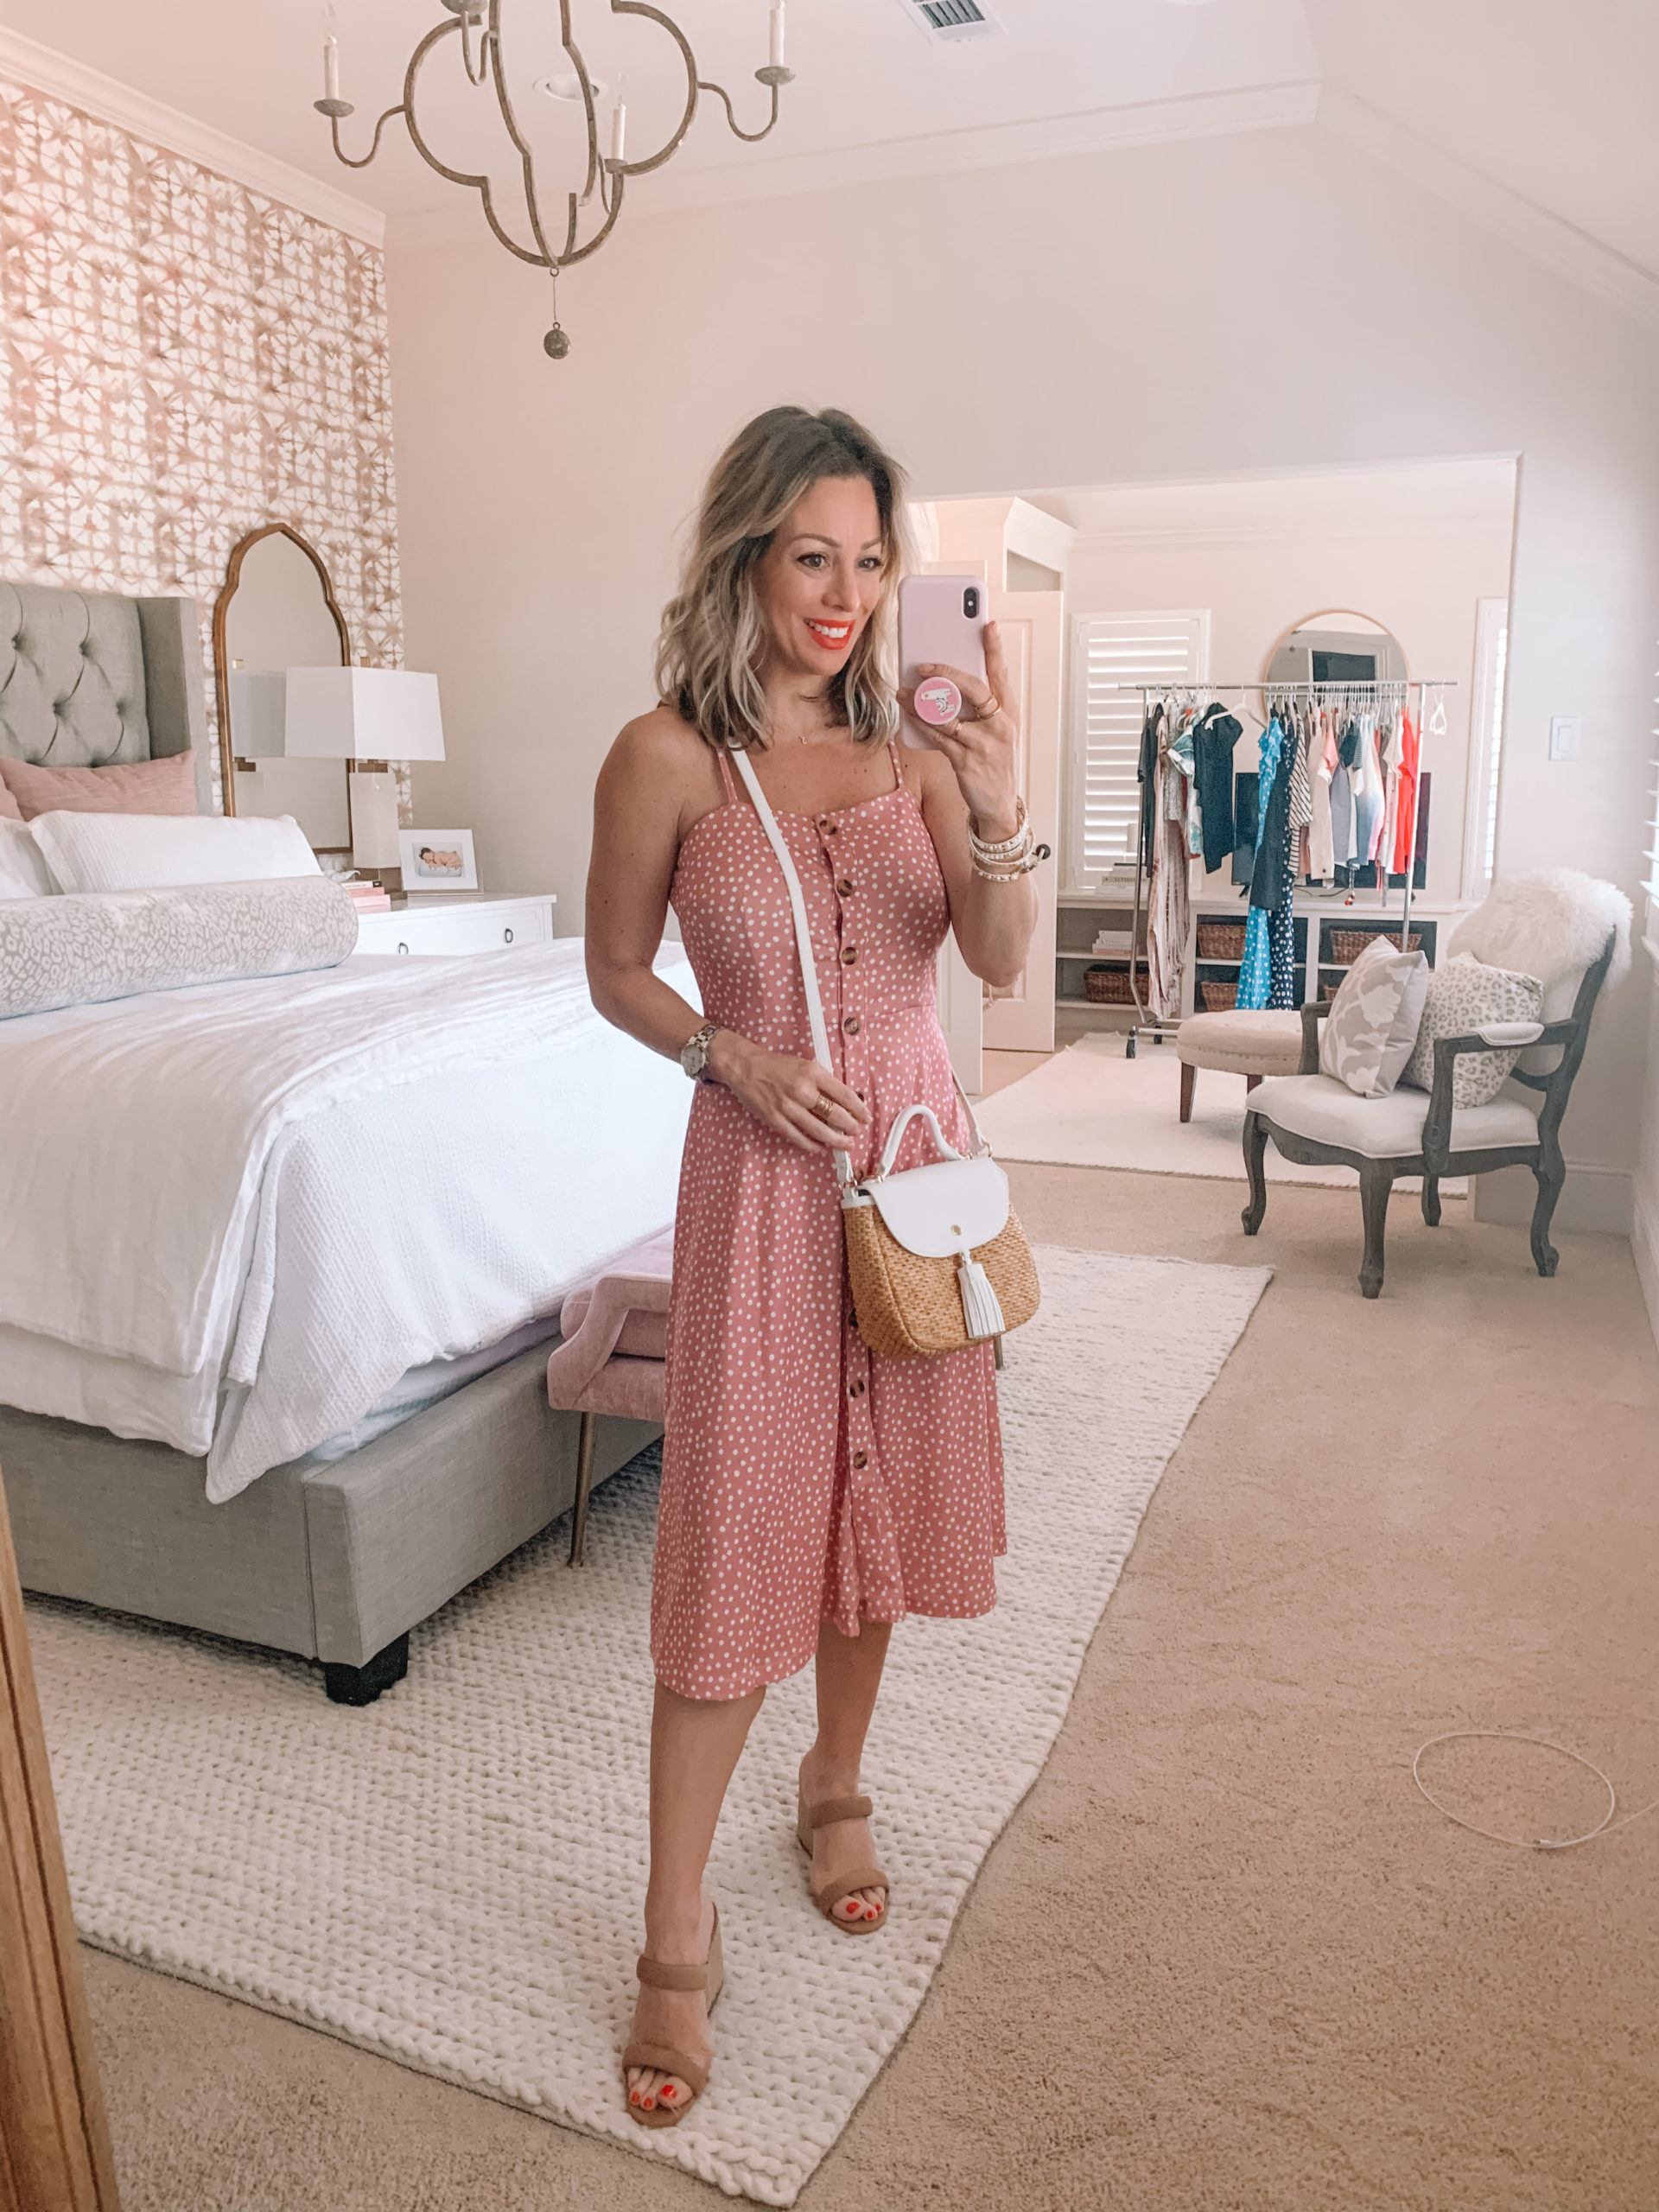 Amazon Fashion - Spaghetti Strap Polka Dot Midi Dress, Wedges, Woven Crossbody